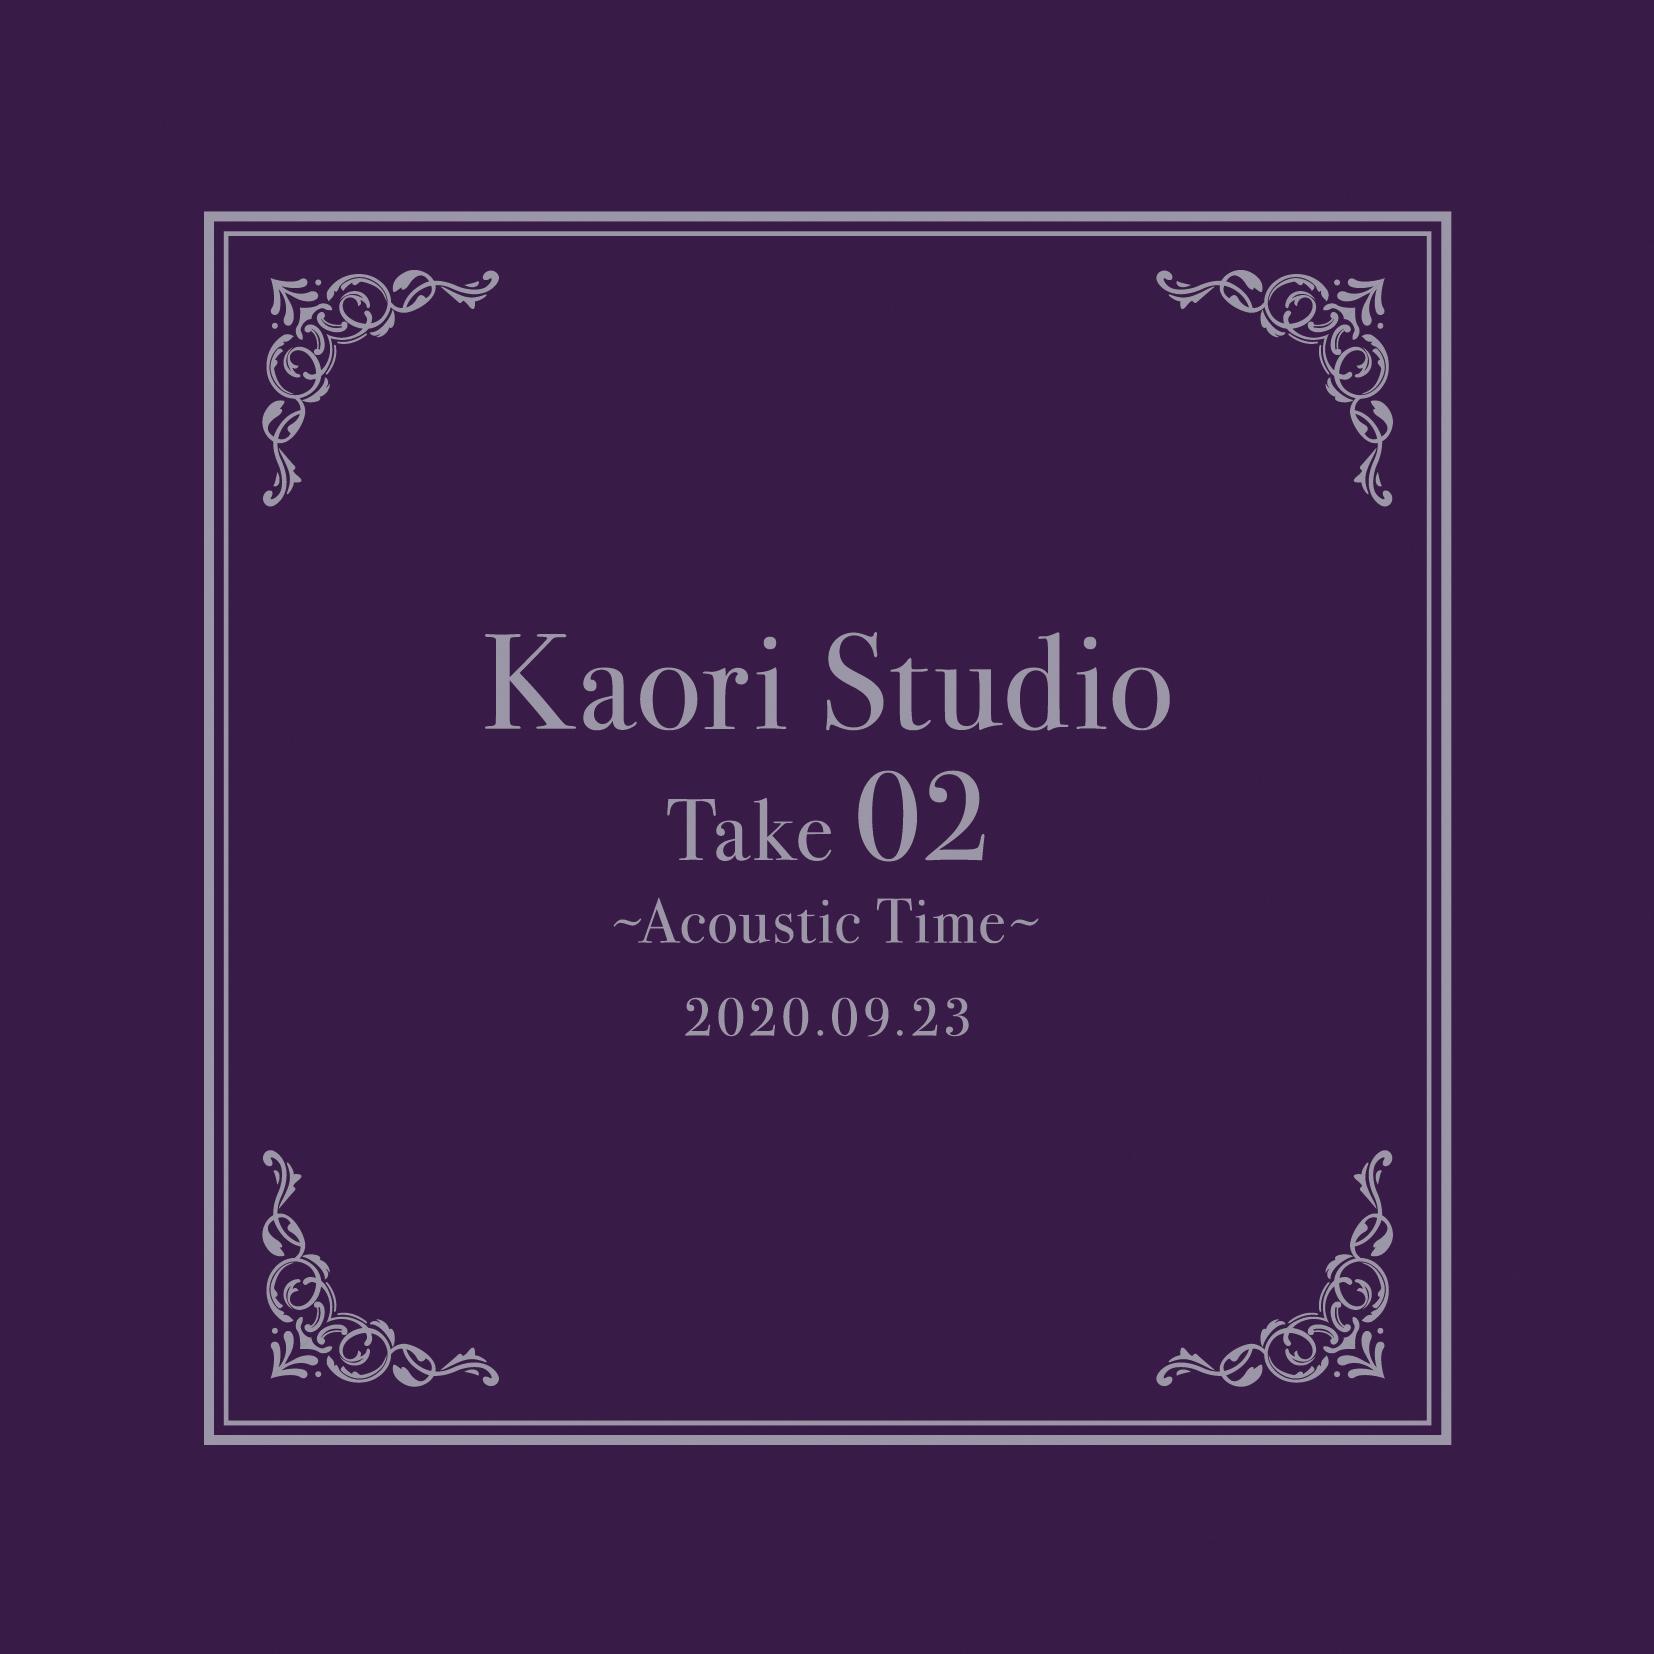 CD【織田かおり】Kaori Studio Take 02 ~Acoustic Time~